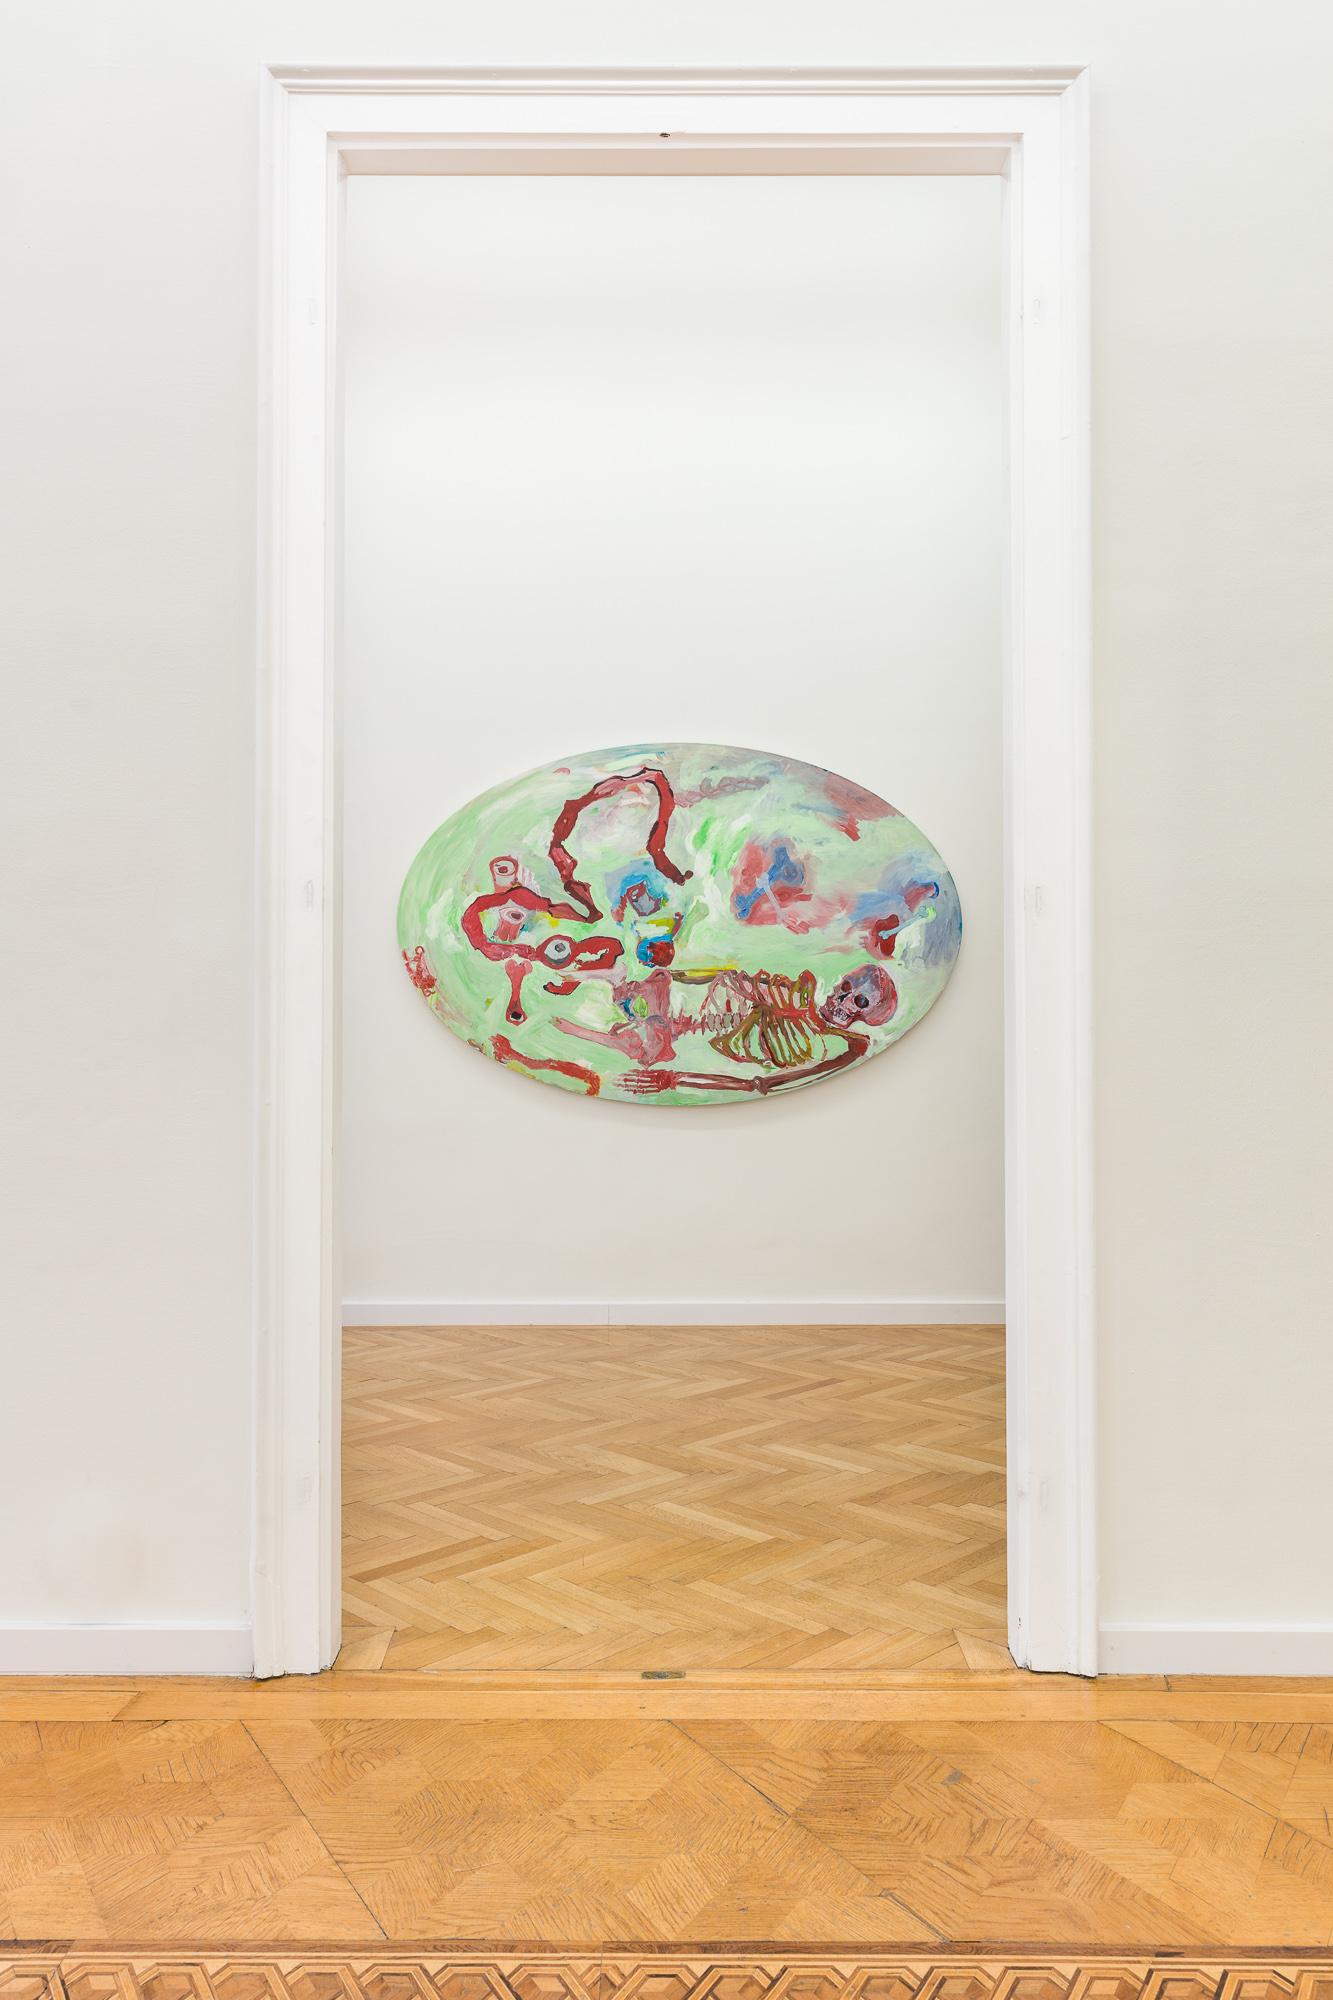 2019_01_28_Georgia Gardner Gray at Croy Nielsen by Kunstdokumentationcom_v2_008_web.jpg